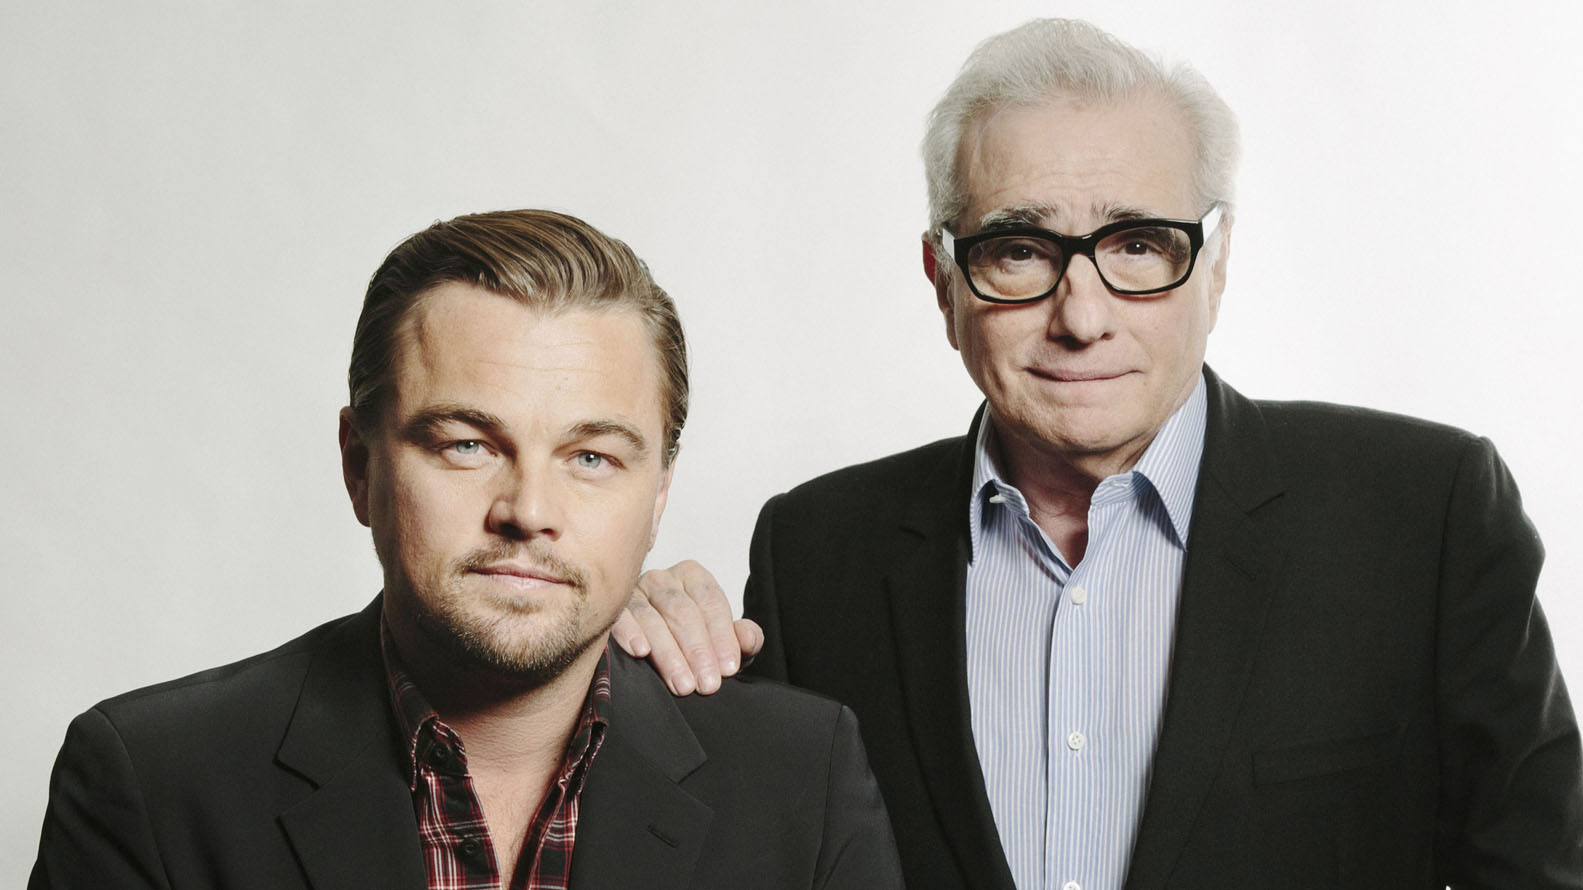 Martin Scorsese y Leonardo DiCaprio han colaborado en cinco largometrajes desde 2002: Gangs of New York, The Aviator, The Departed, Shutter Island y The Wolf of Wall Street